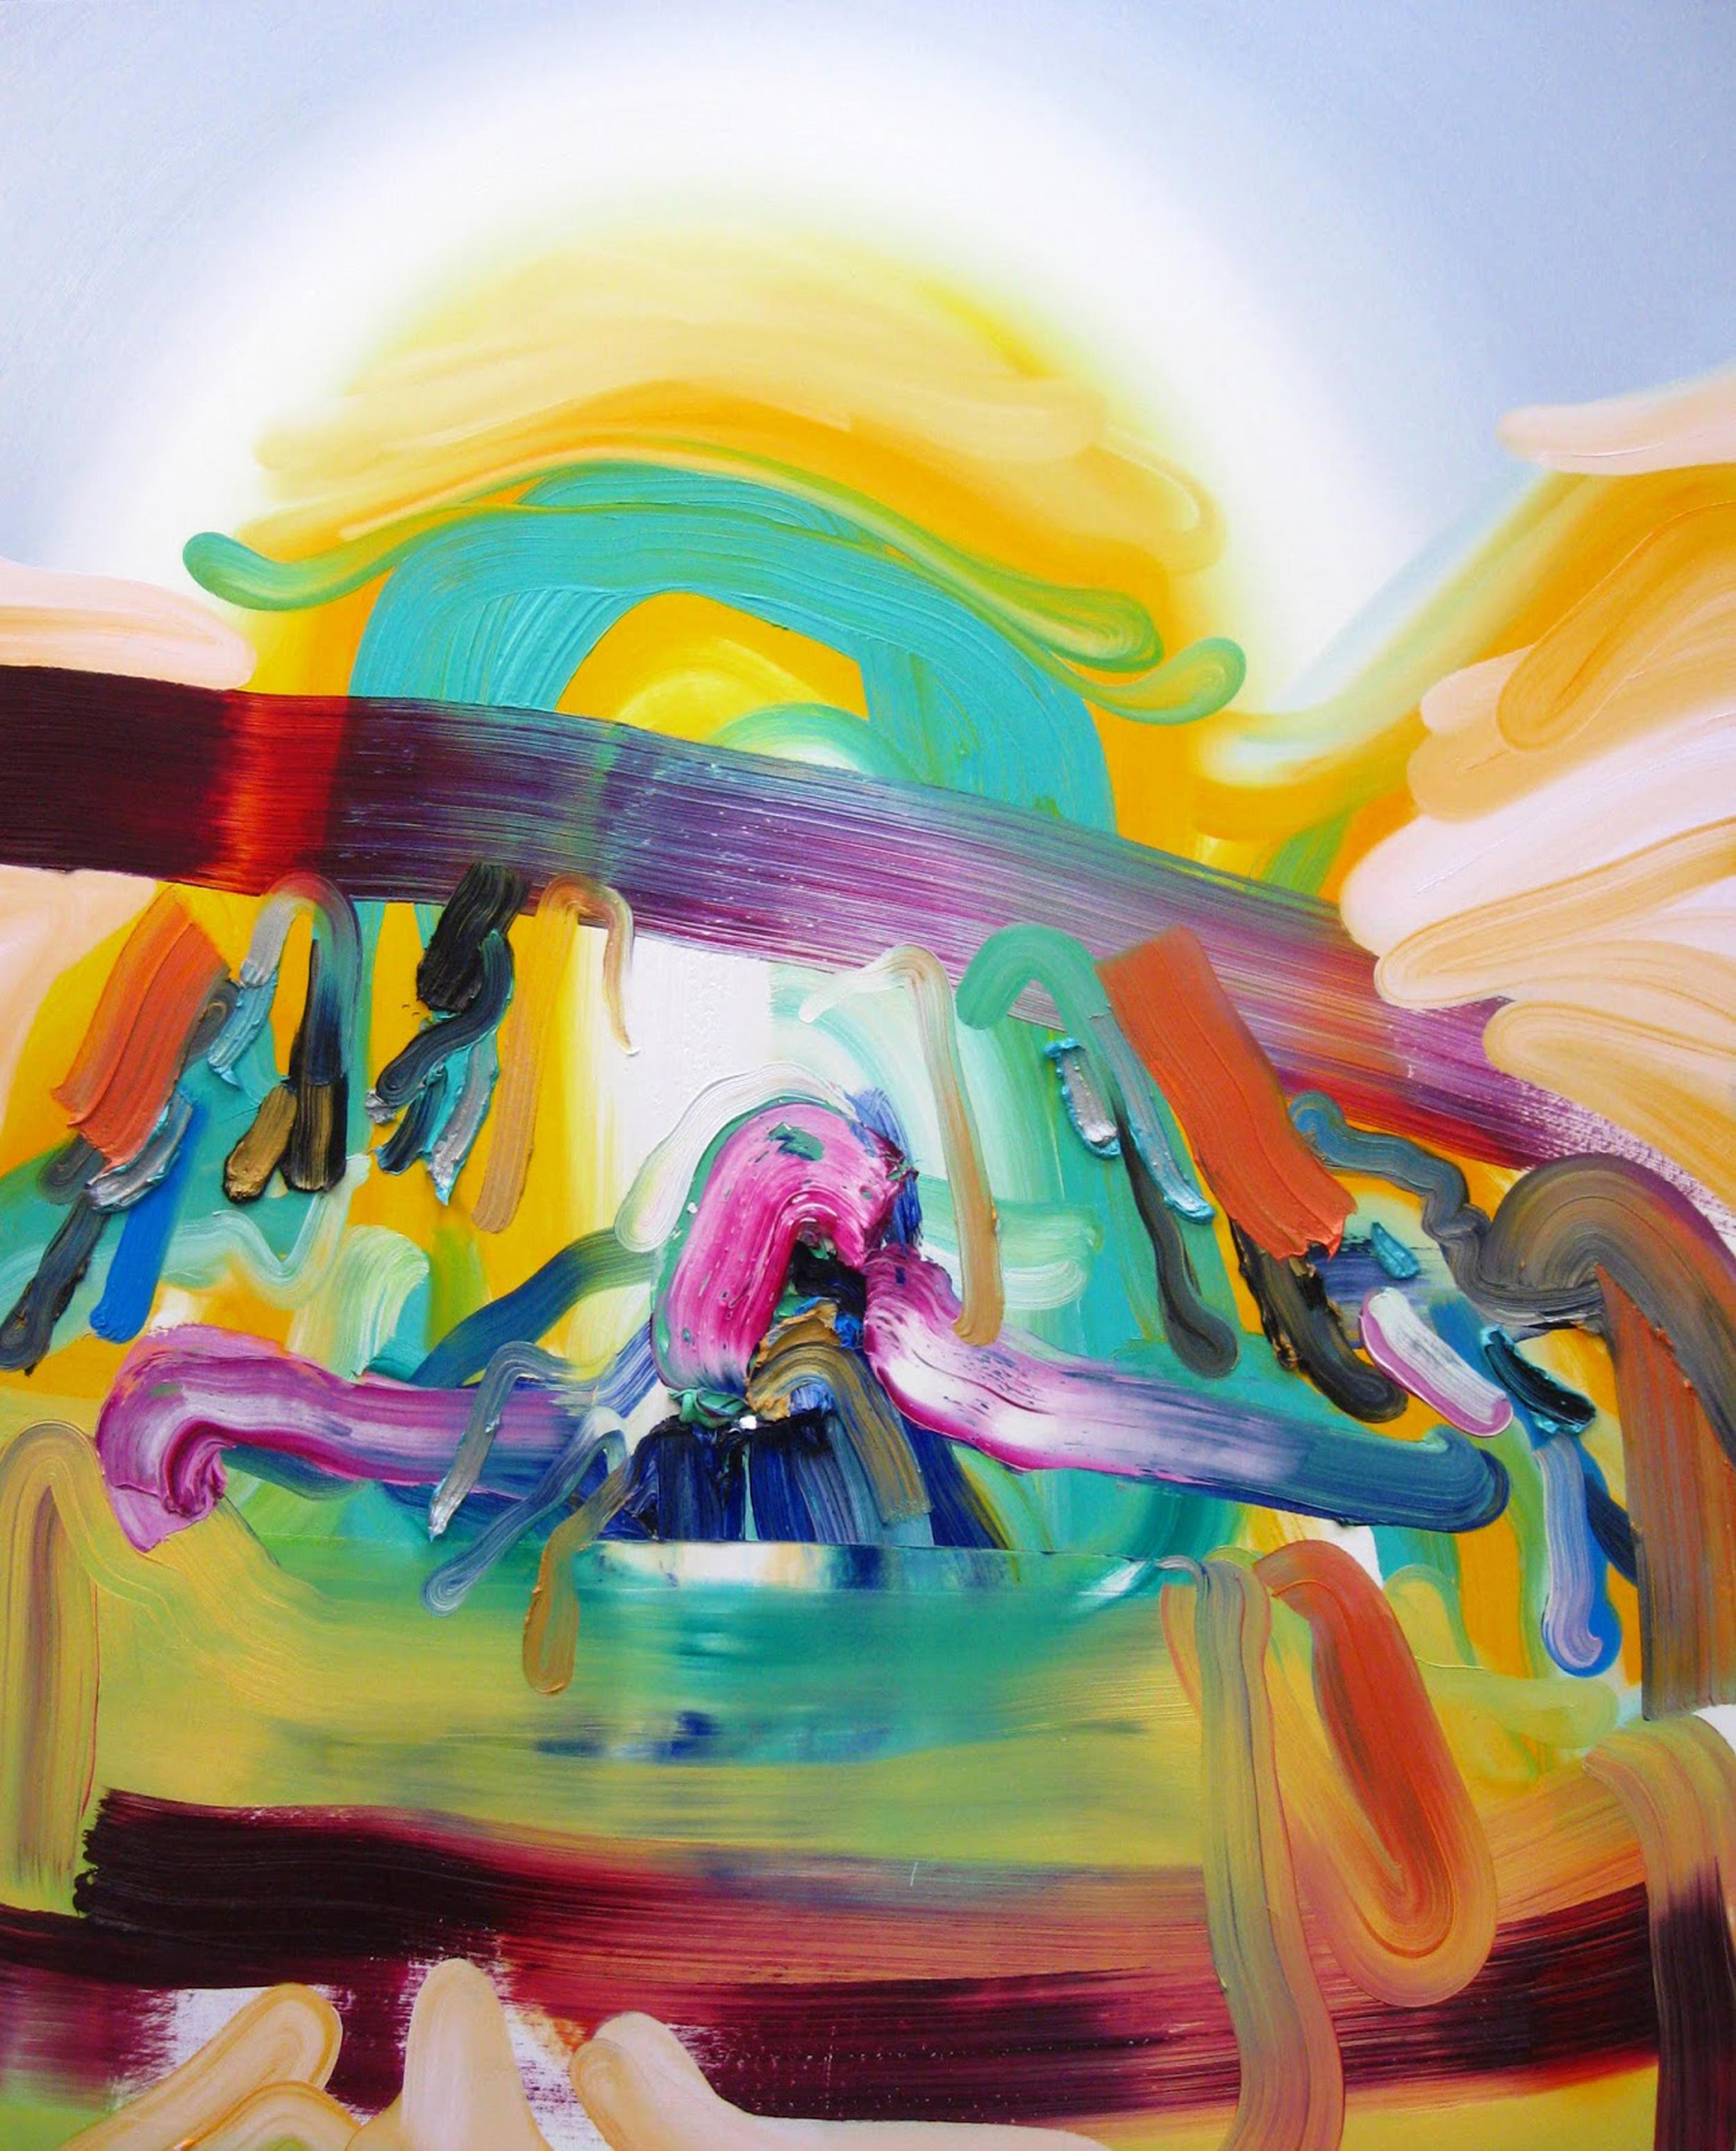 Rain Dance / oil on canvas / 50 x 40 inches